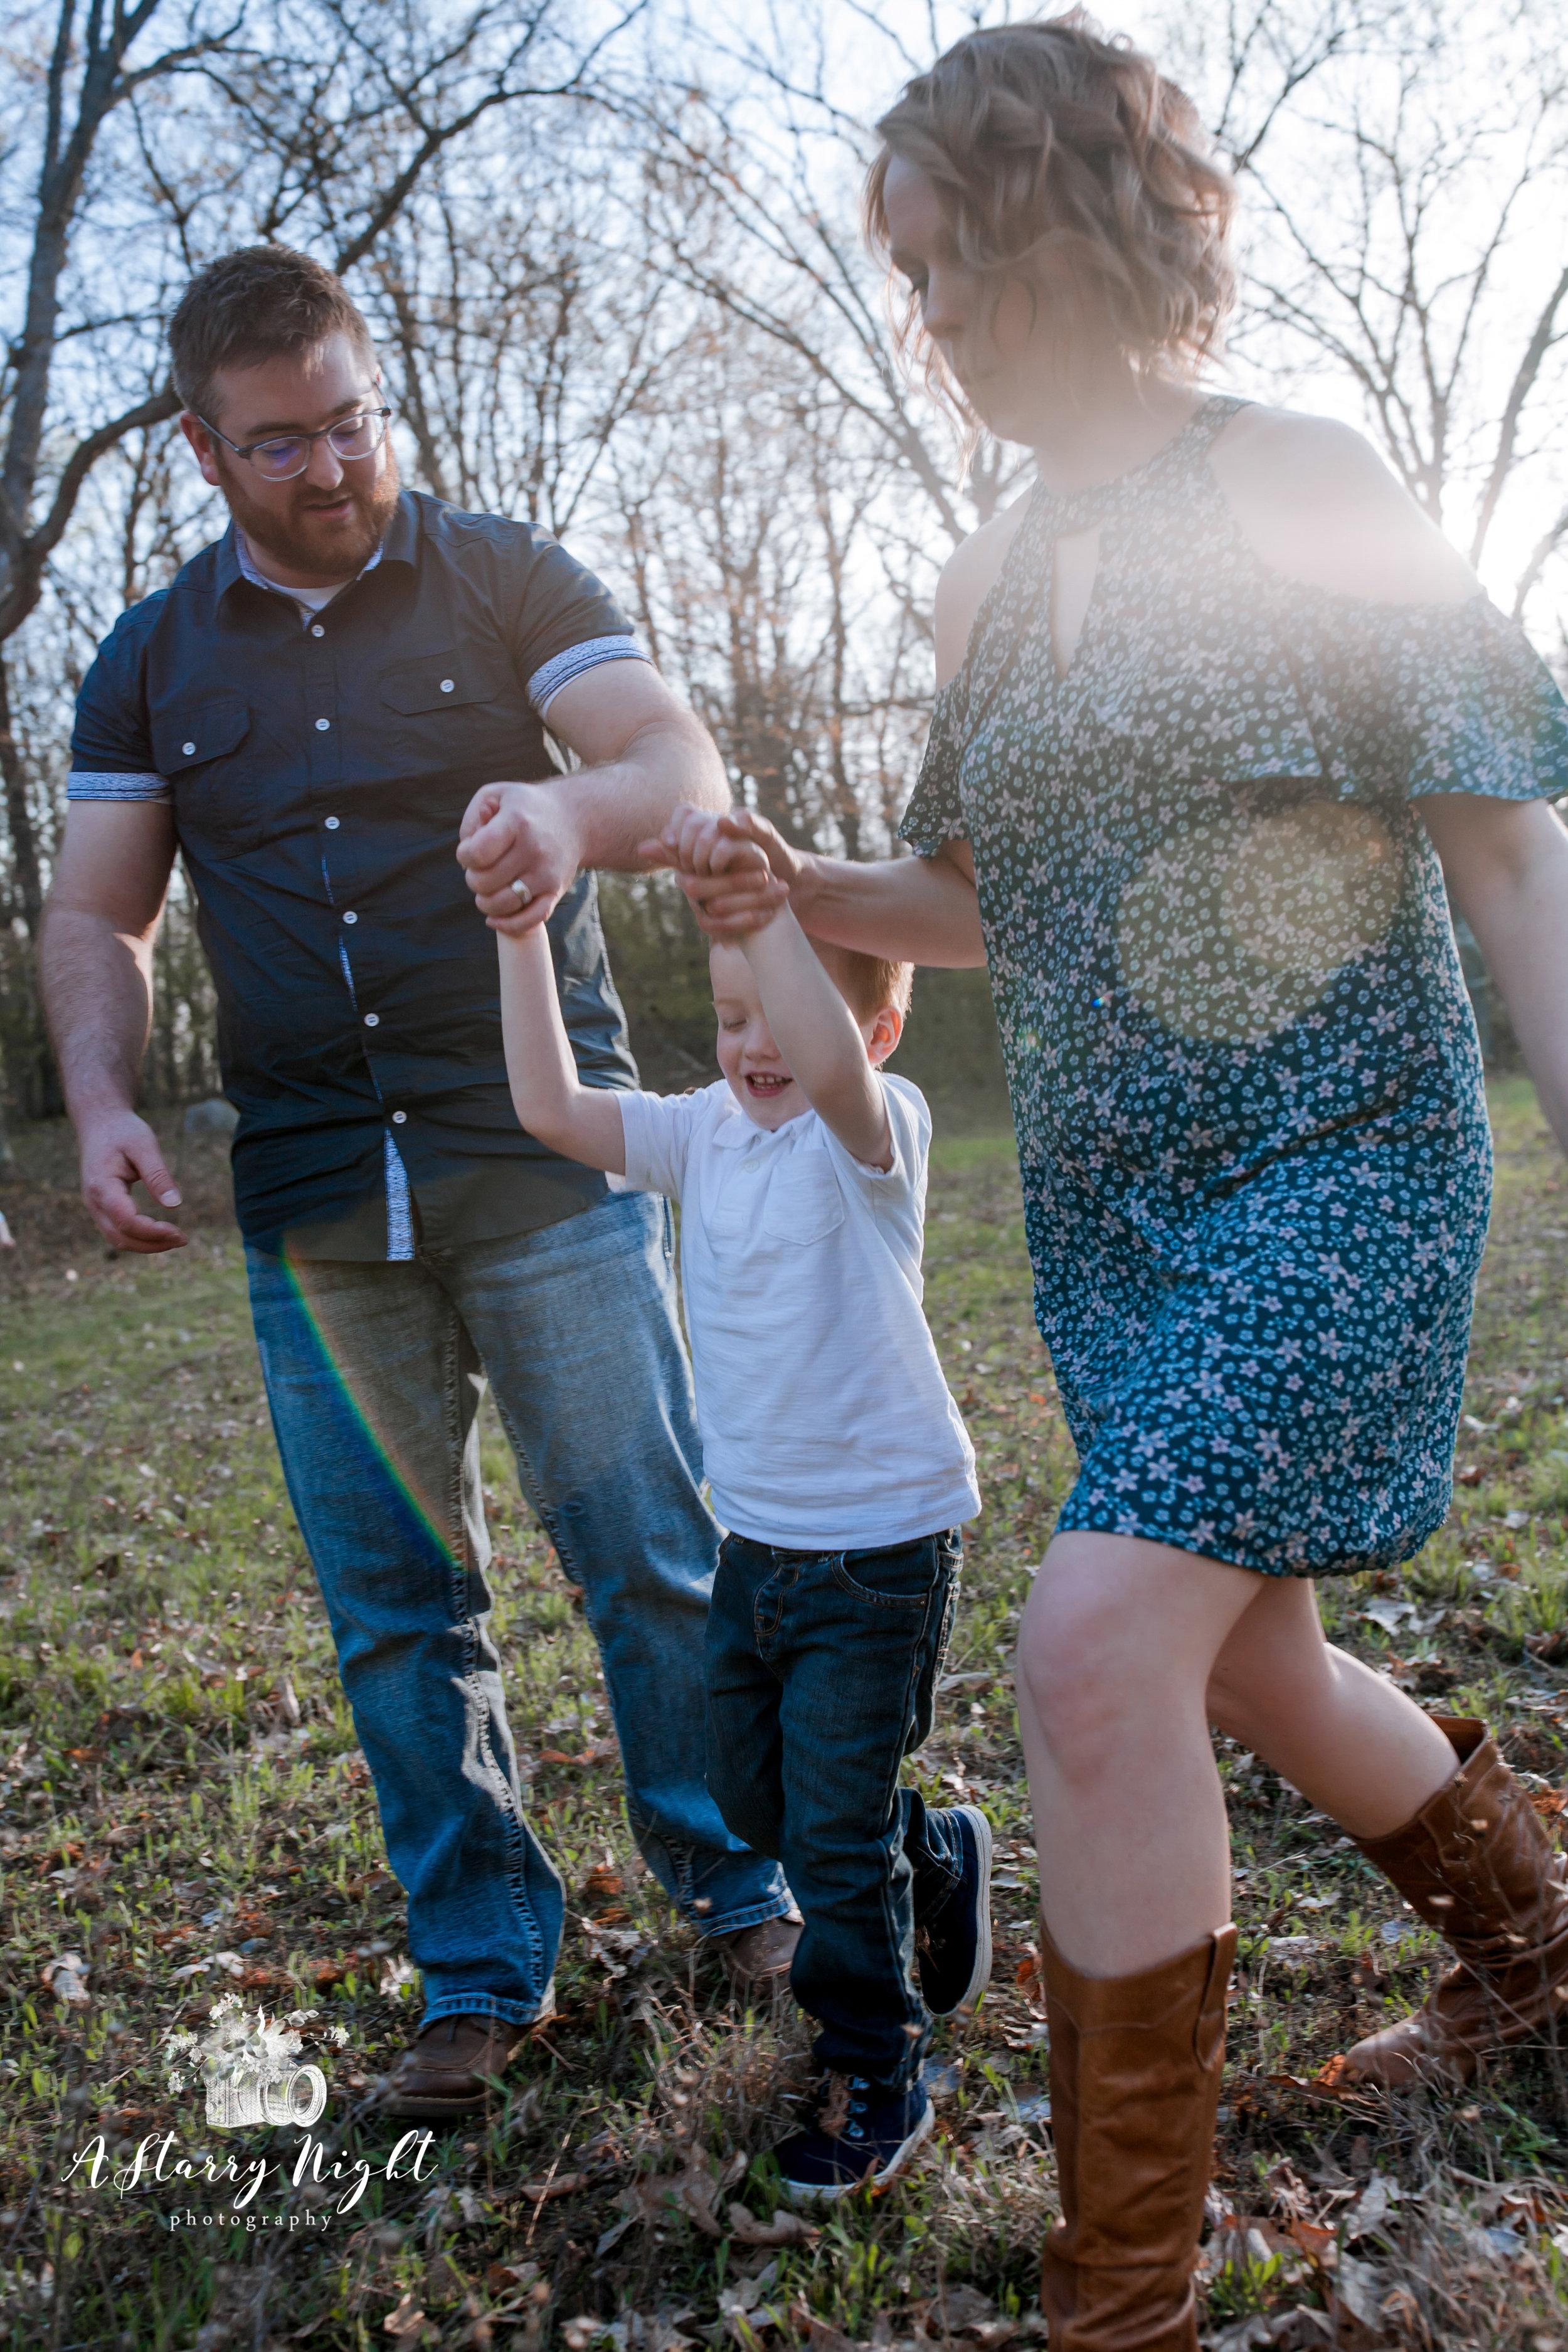 Clare-Midland-Michigan-Family-Photography-swinging.jpg